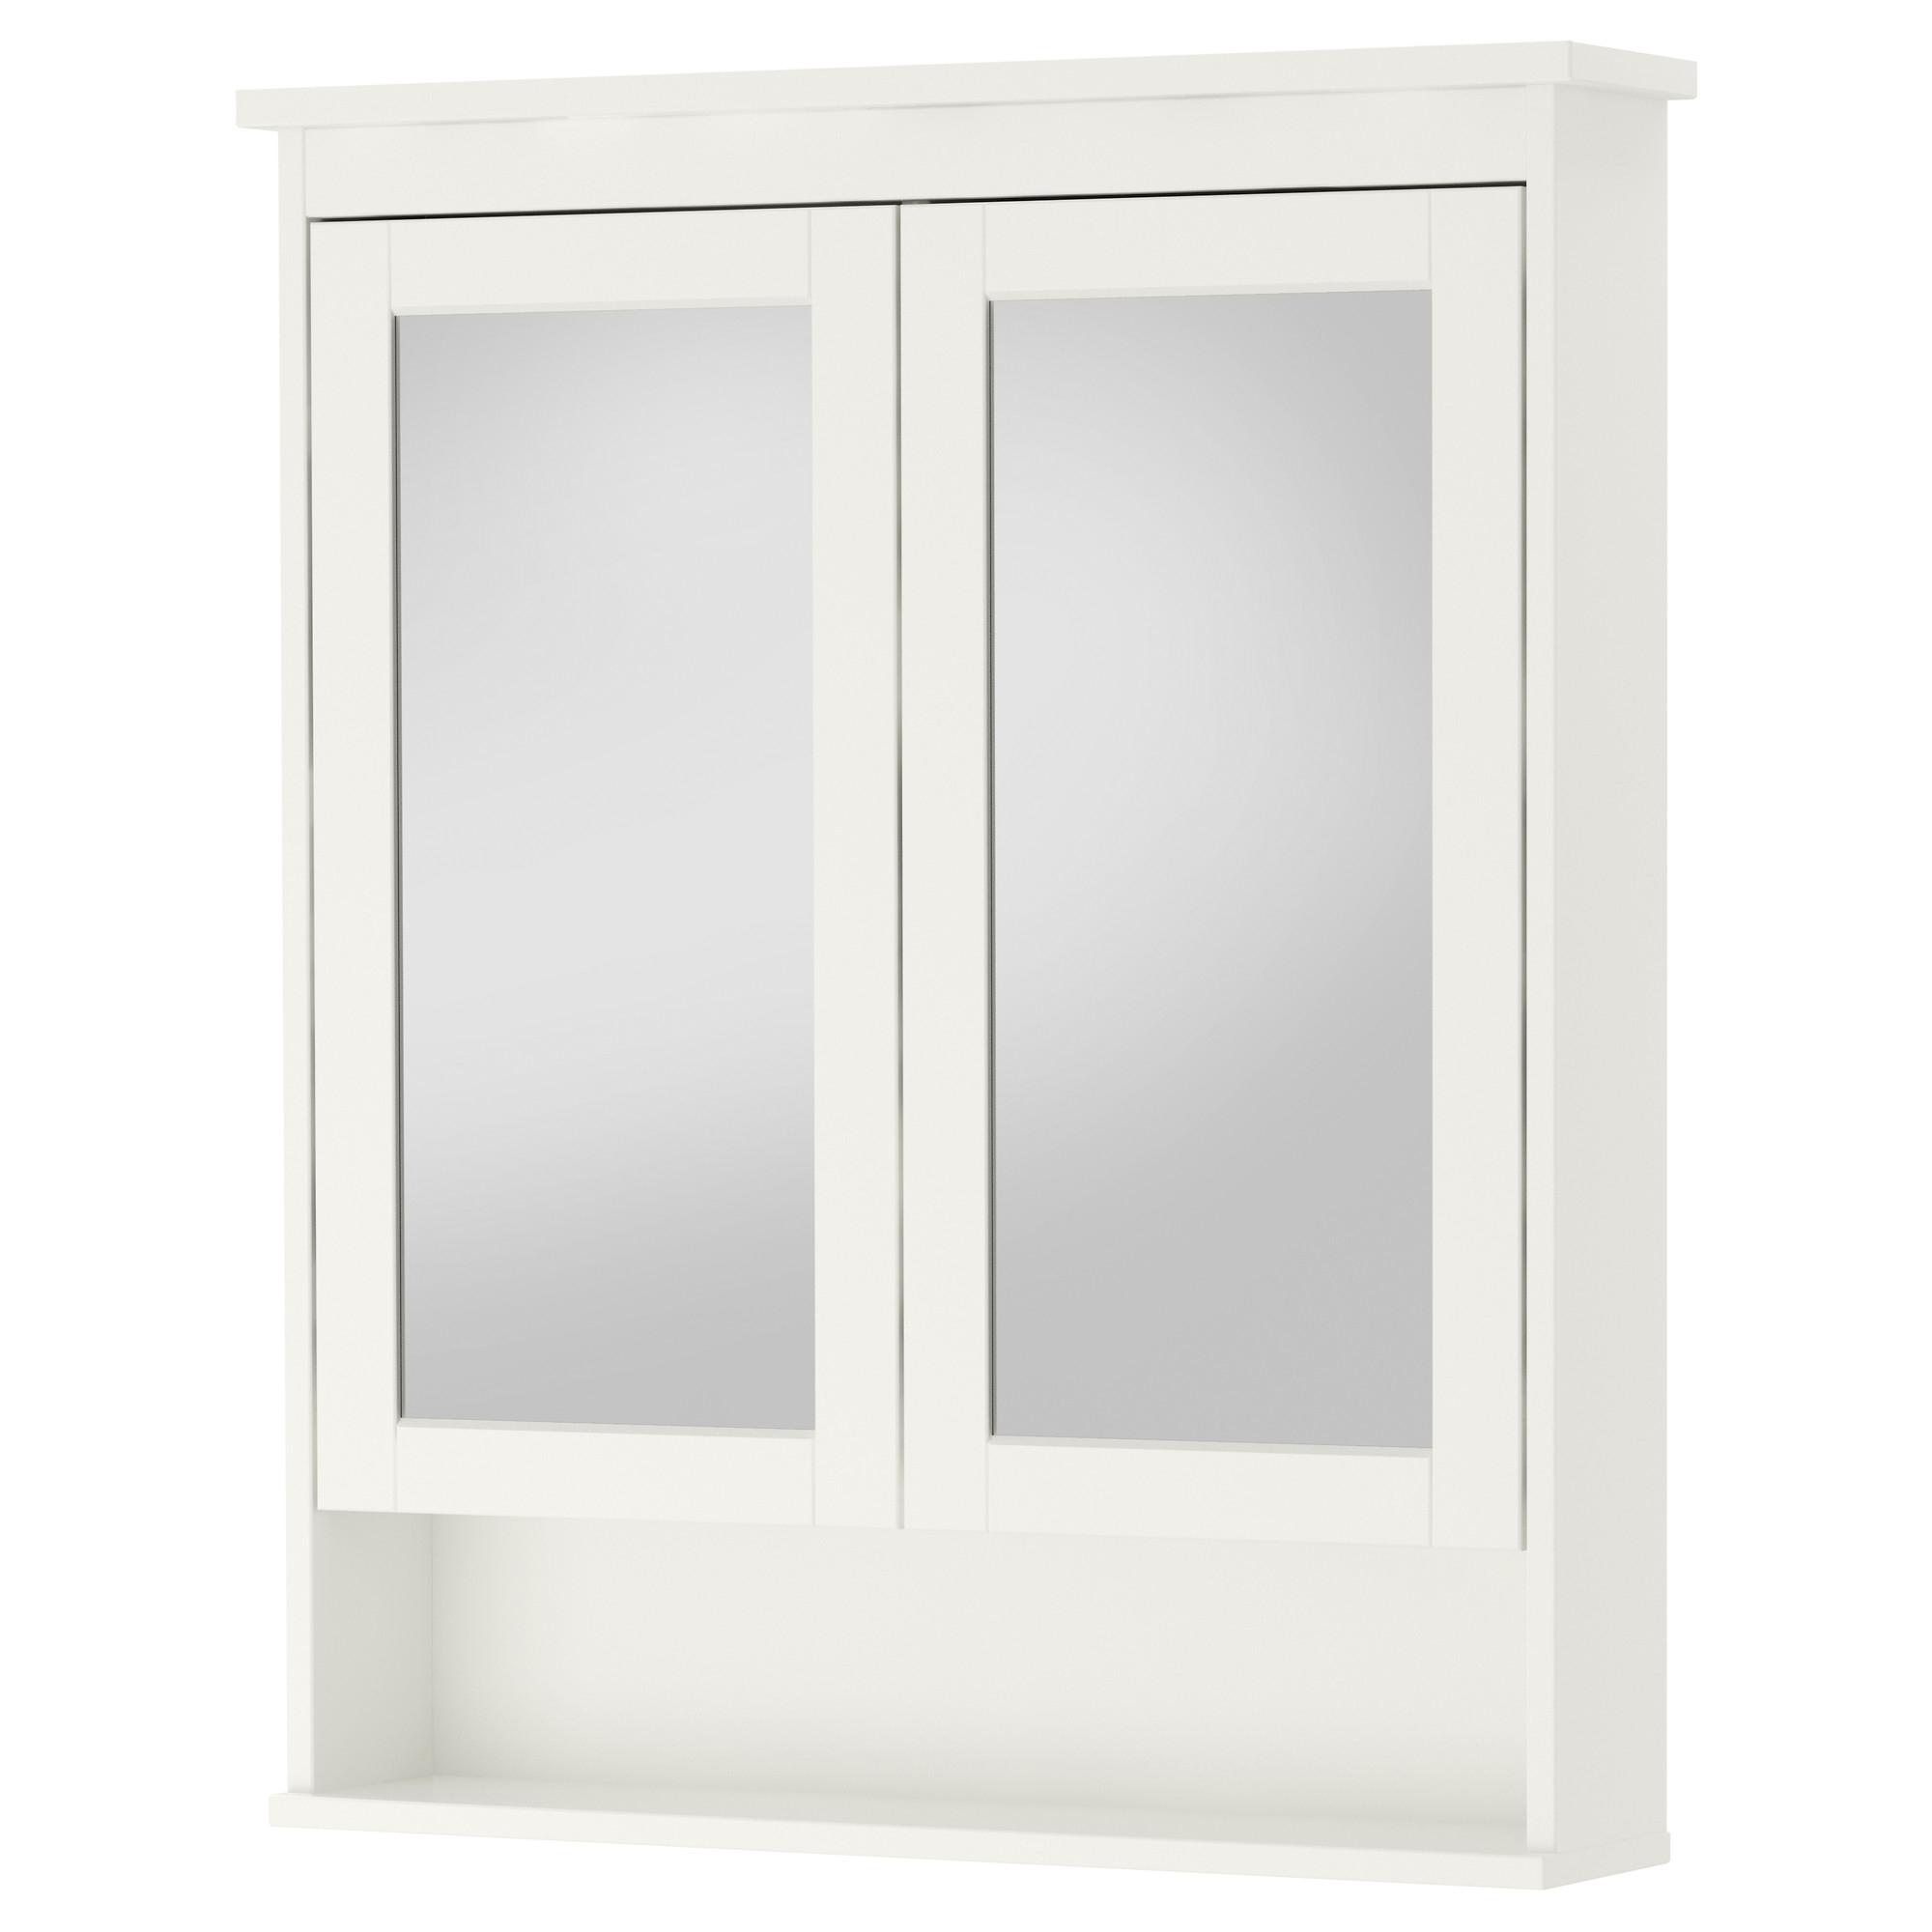 Hemnes armario de espejo con 2 puertas - Espejo hemnes ikea ...